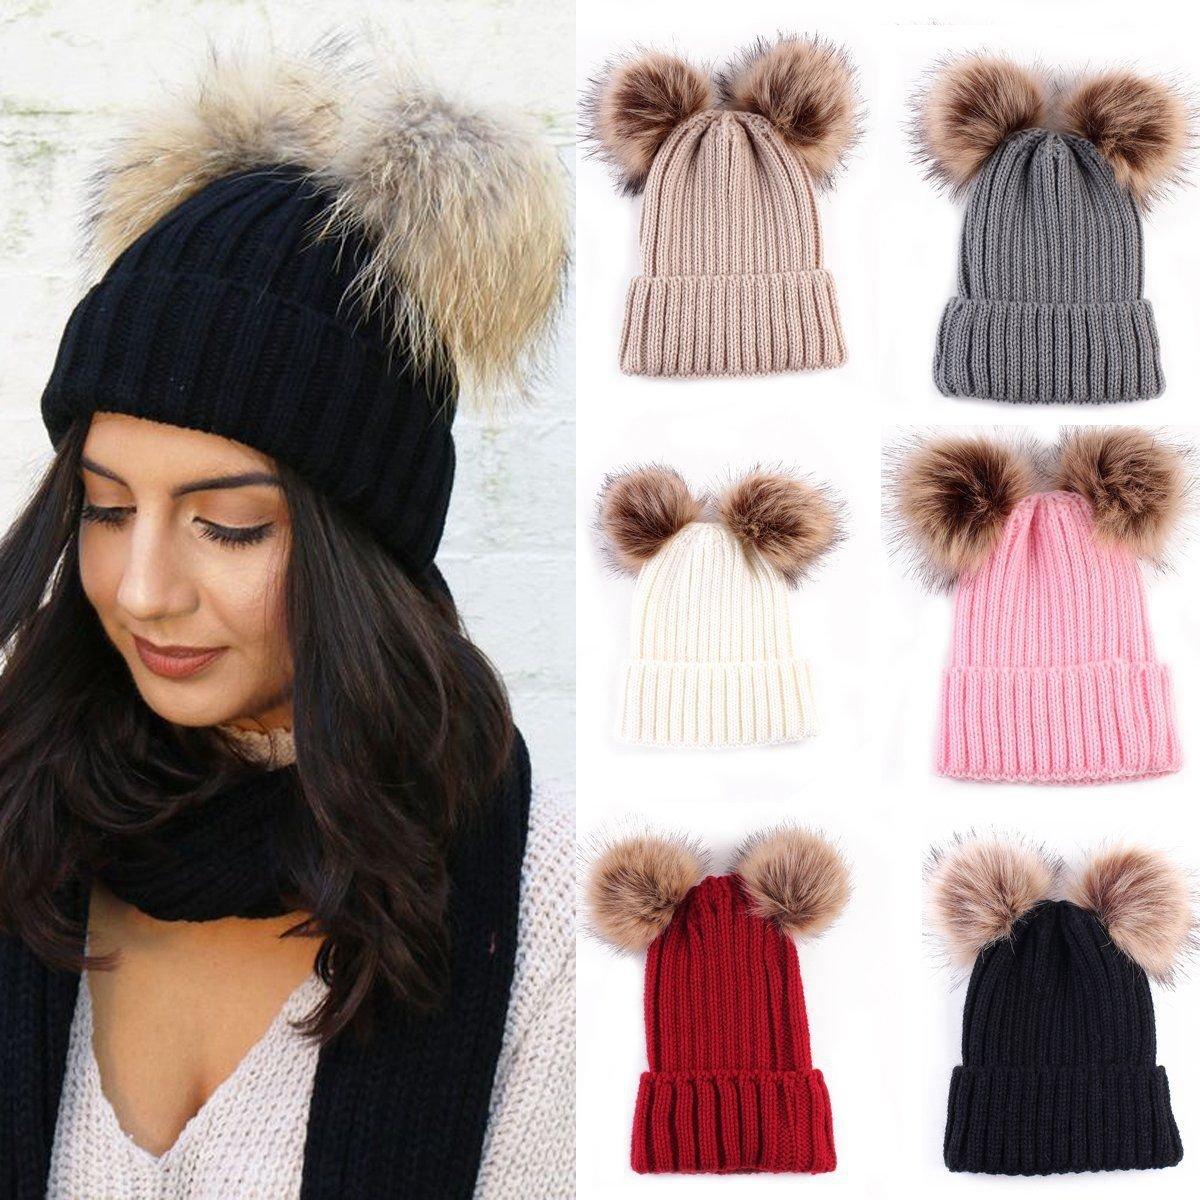 Braided Crochet Wool Knit Beanie Beret Ski Ball Cap Baggy Womens Winter Warm Hat new